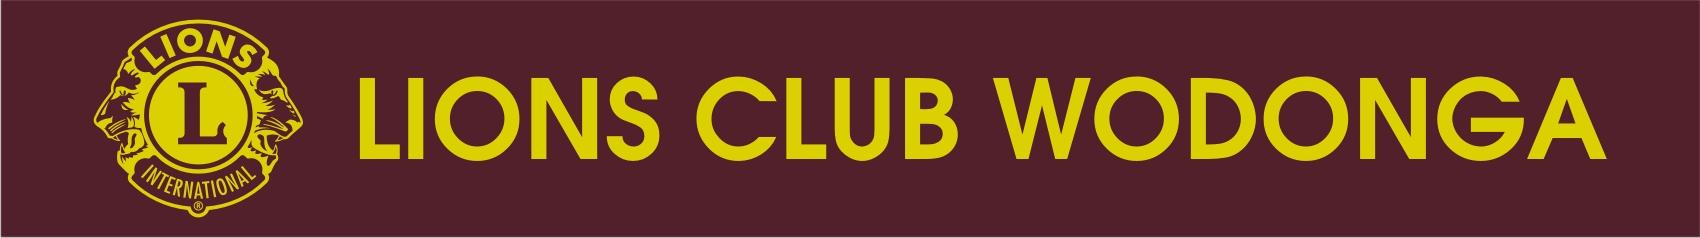 Lions Club Wodonga